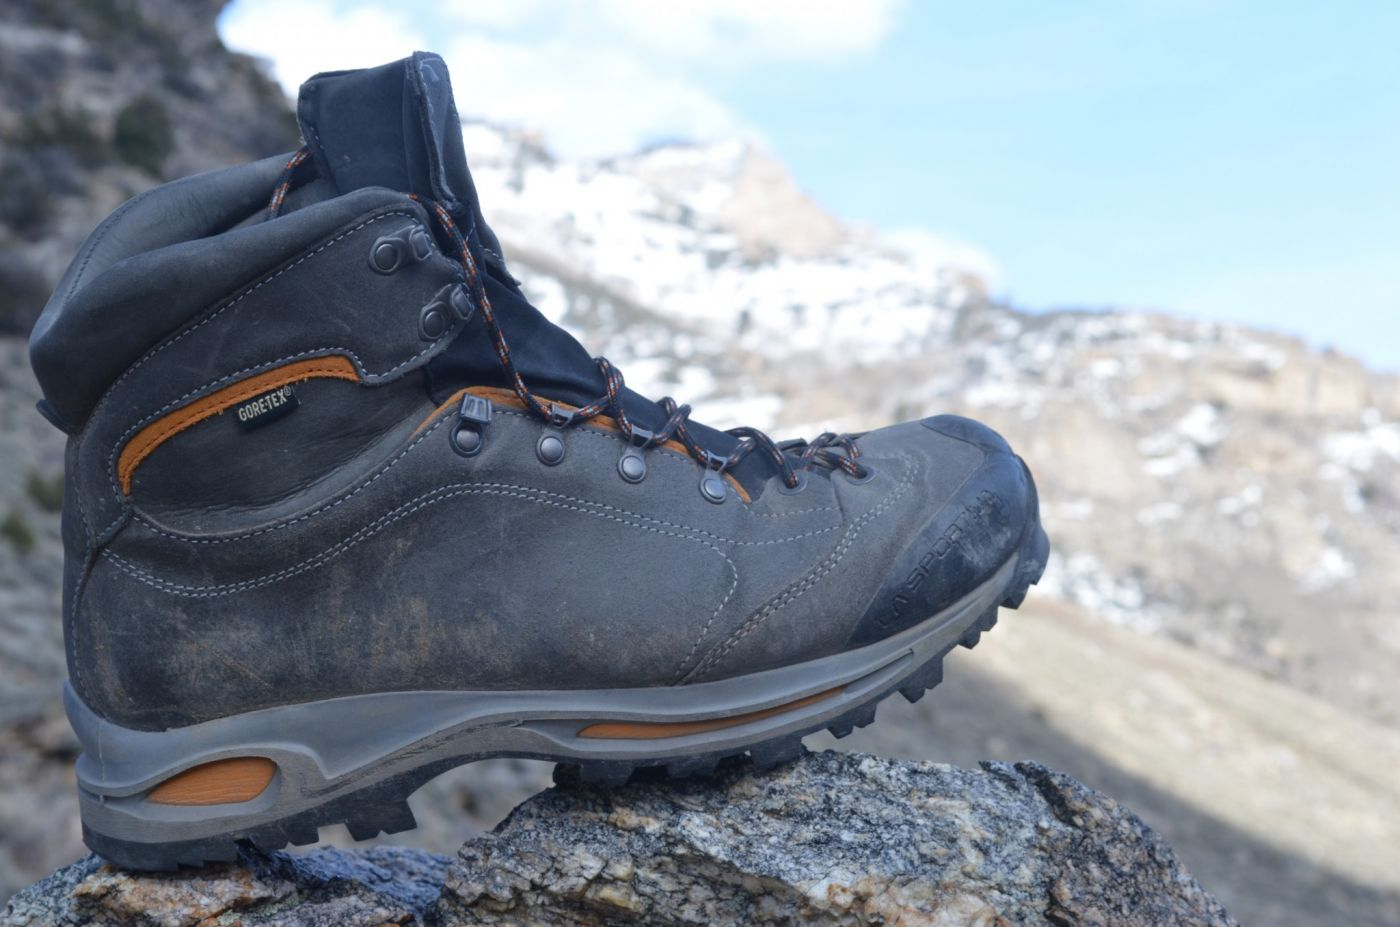 f148ad7be21 La Sportiva Omega GTX Hiking Boots Review - FeedTheHabit.com